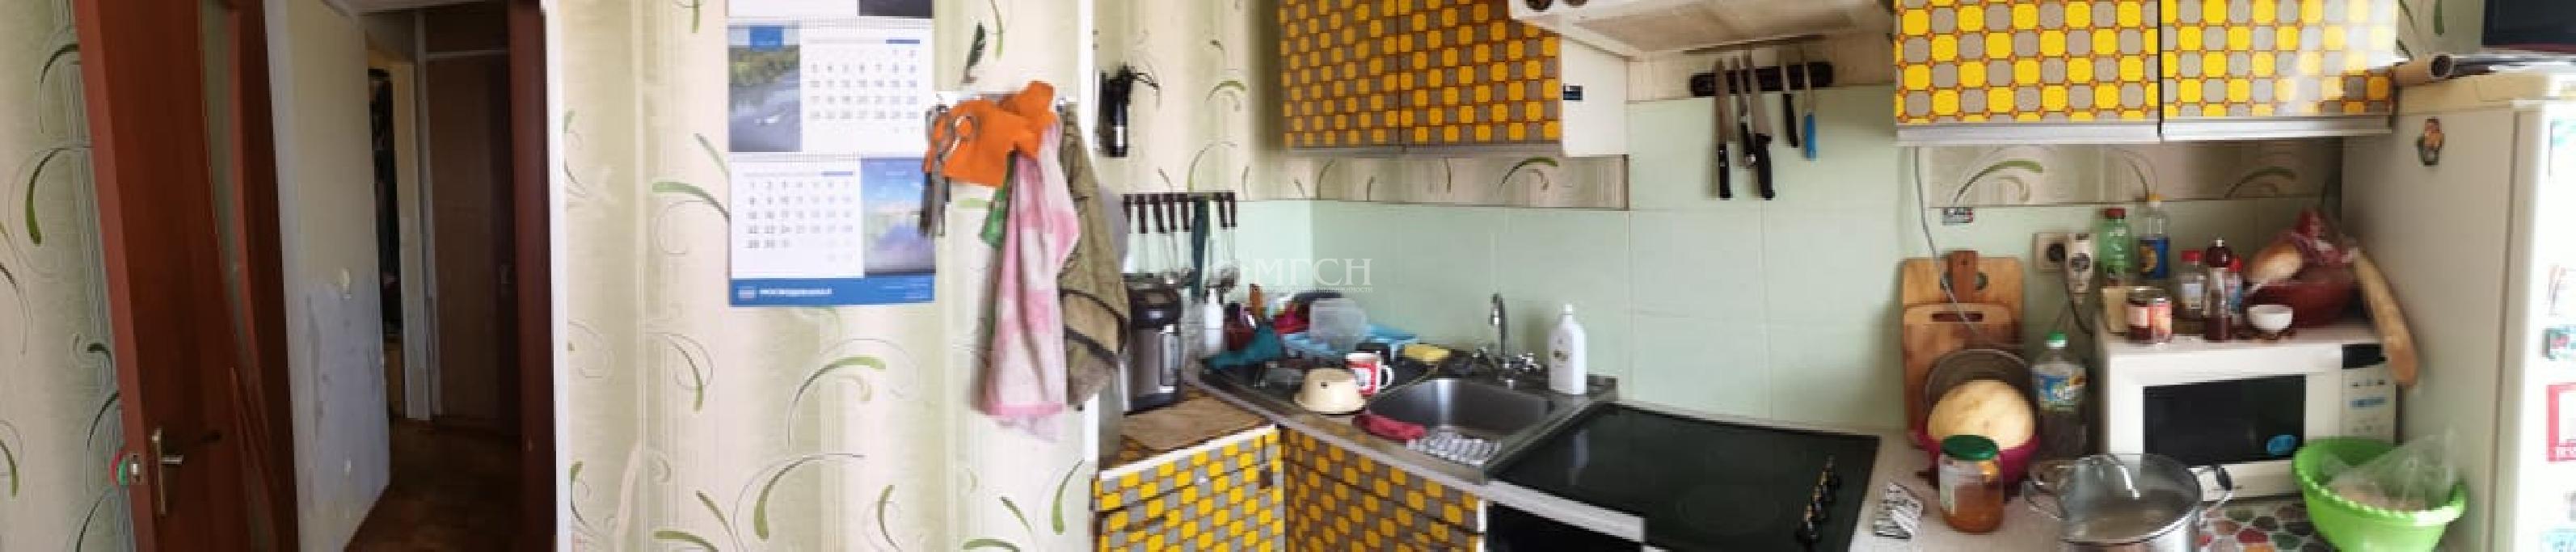 фото 2 ком. квартира - Москва, м. Зябликово, Гурьевский проезд